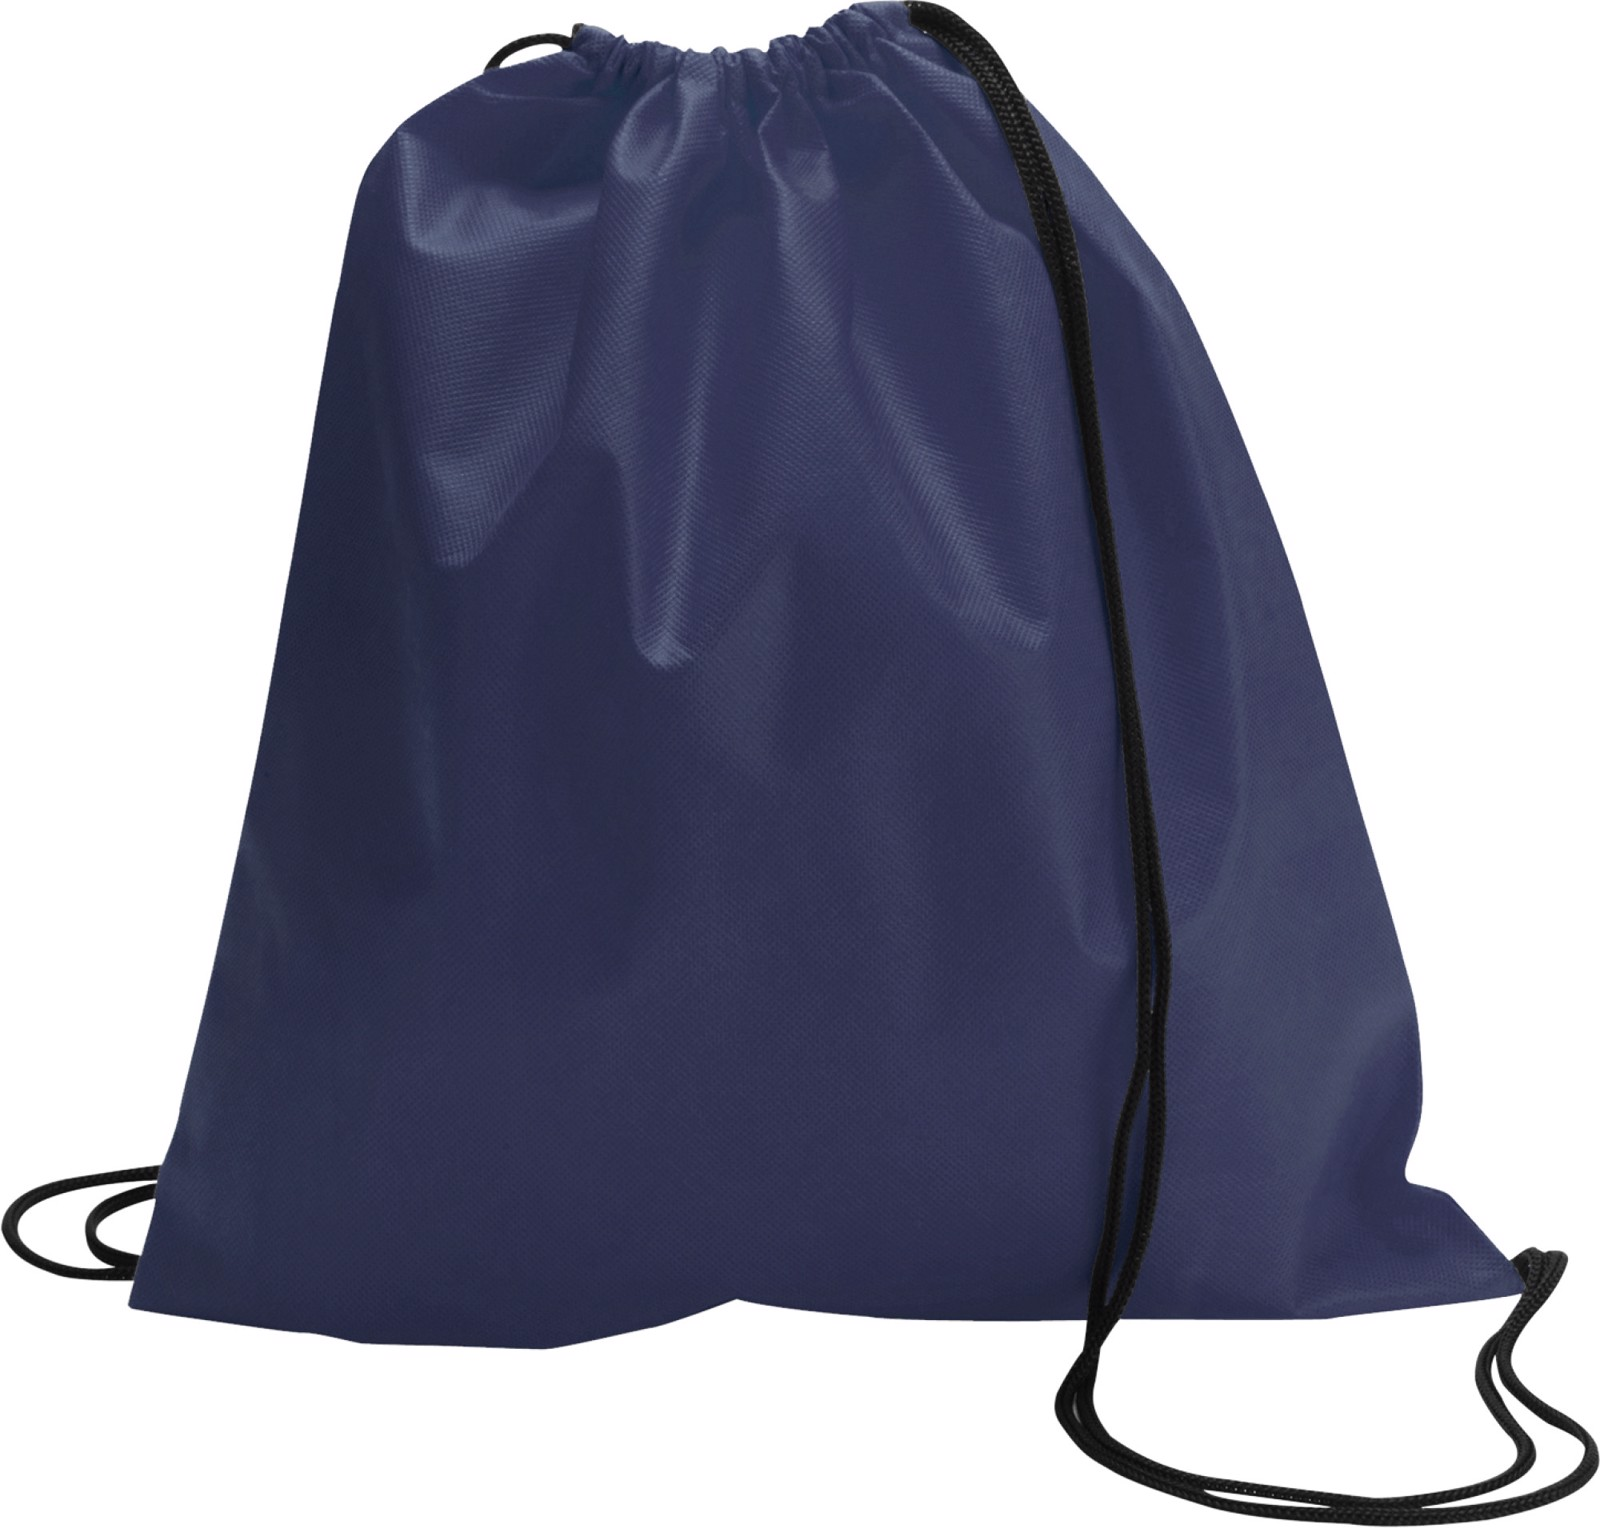 Nonwoven (80 gr/m²) drawstring backpack - Blue